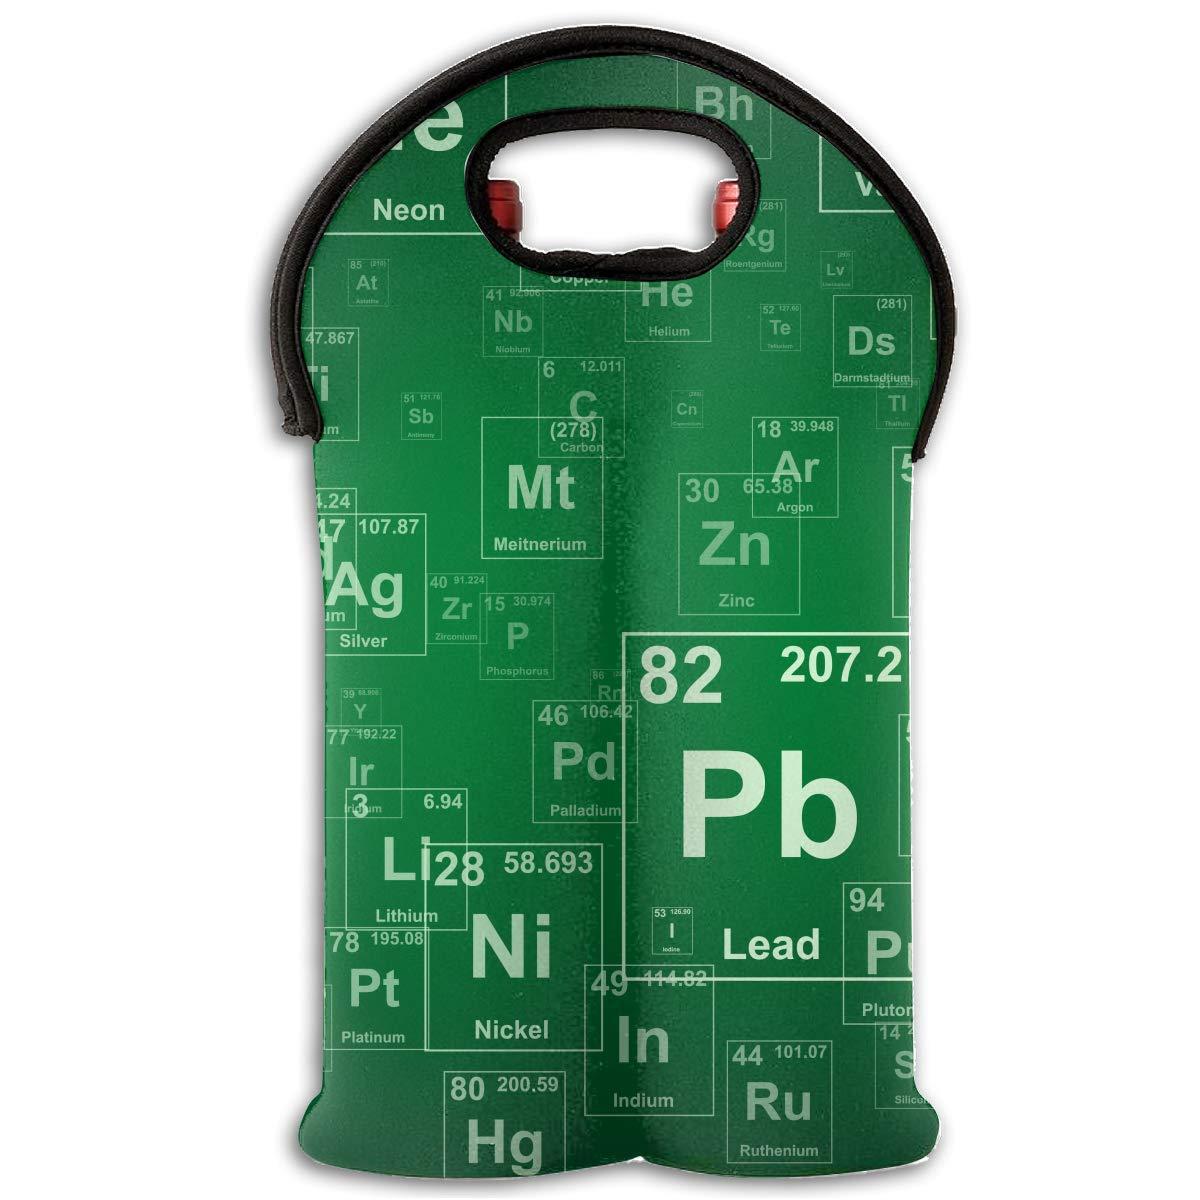 Chemical Element Two Bottle Wine Carrier Tote Bag Neoprene Wine/Water Bottle Holder Keeps Bottles Protected Multicolor6